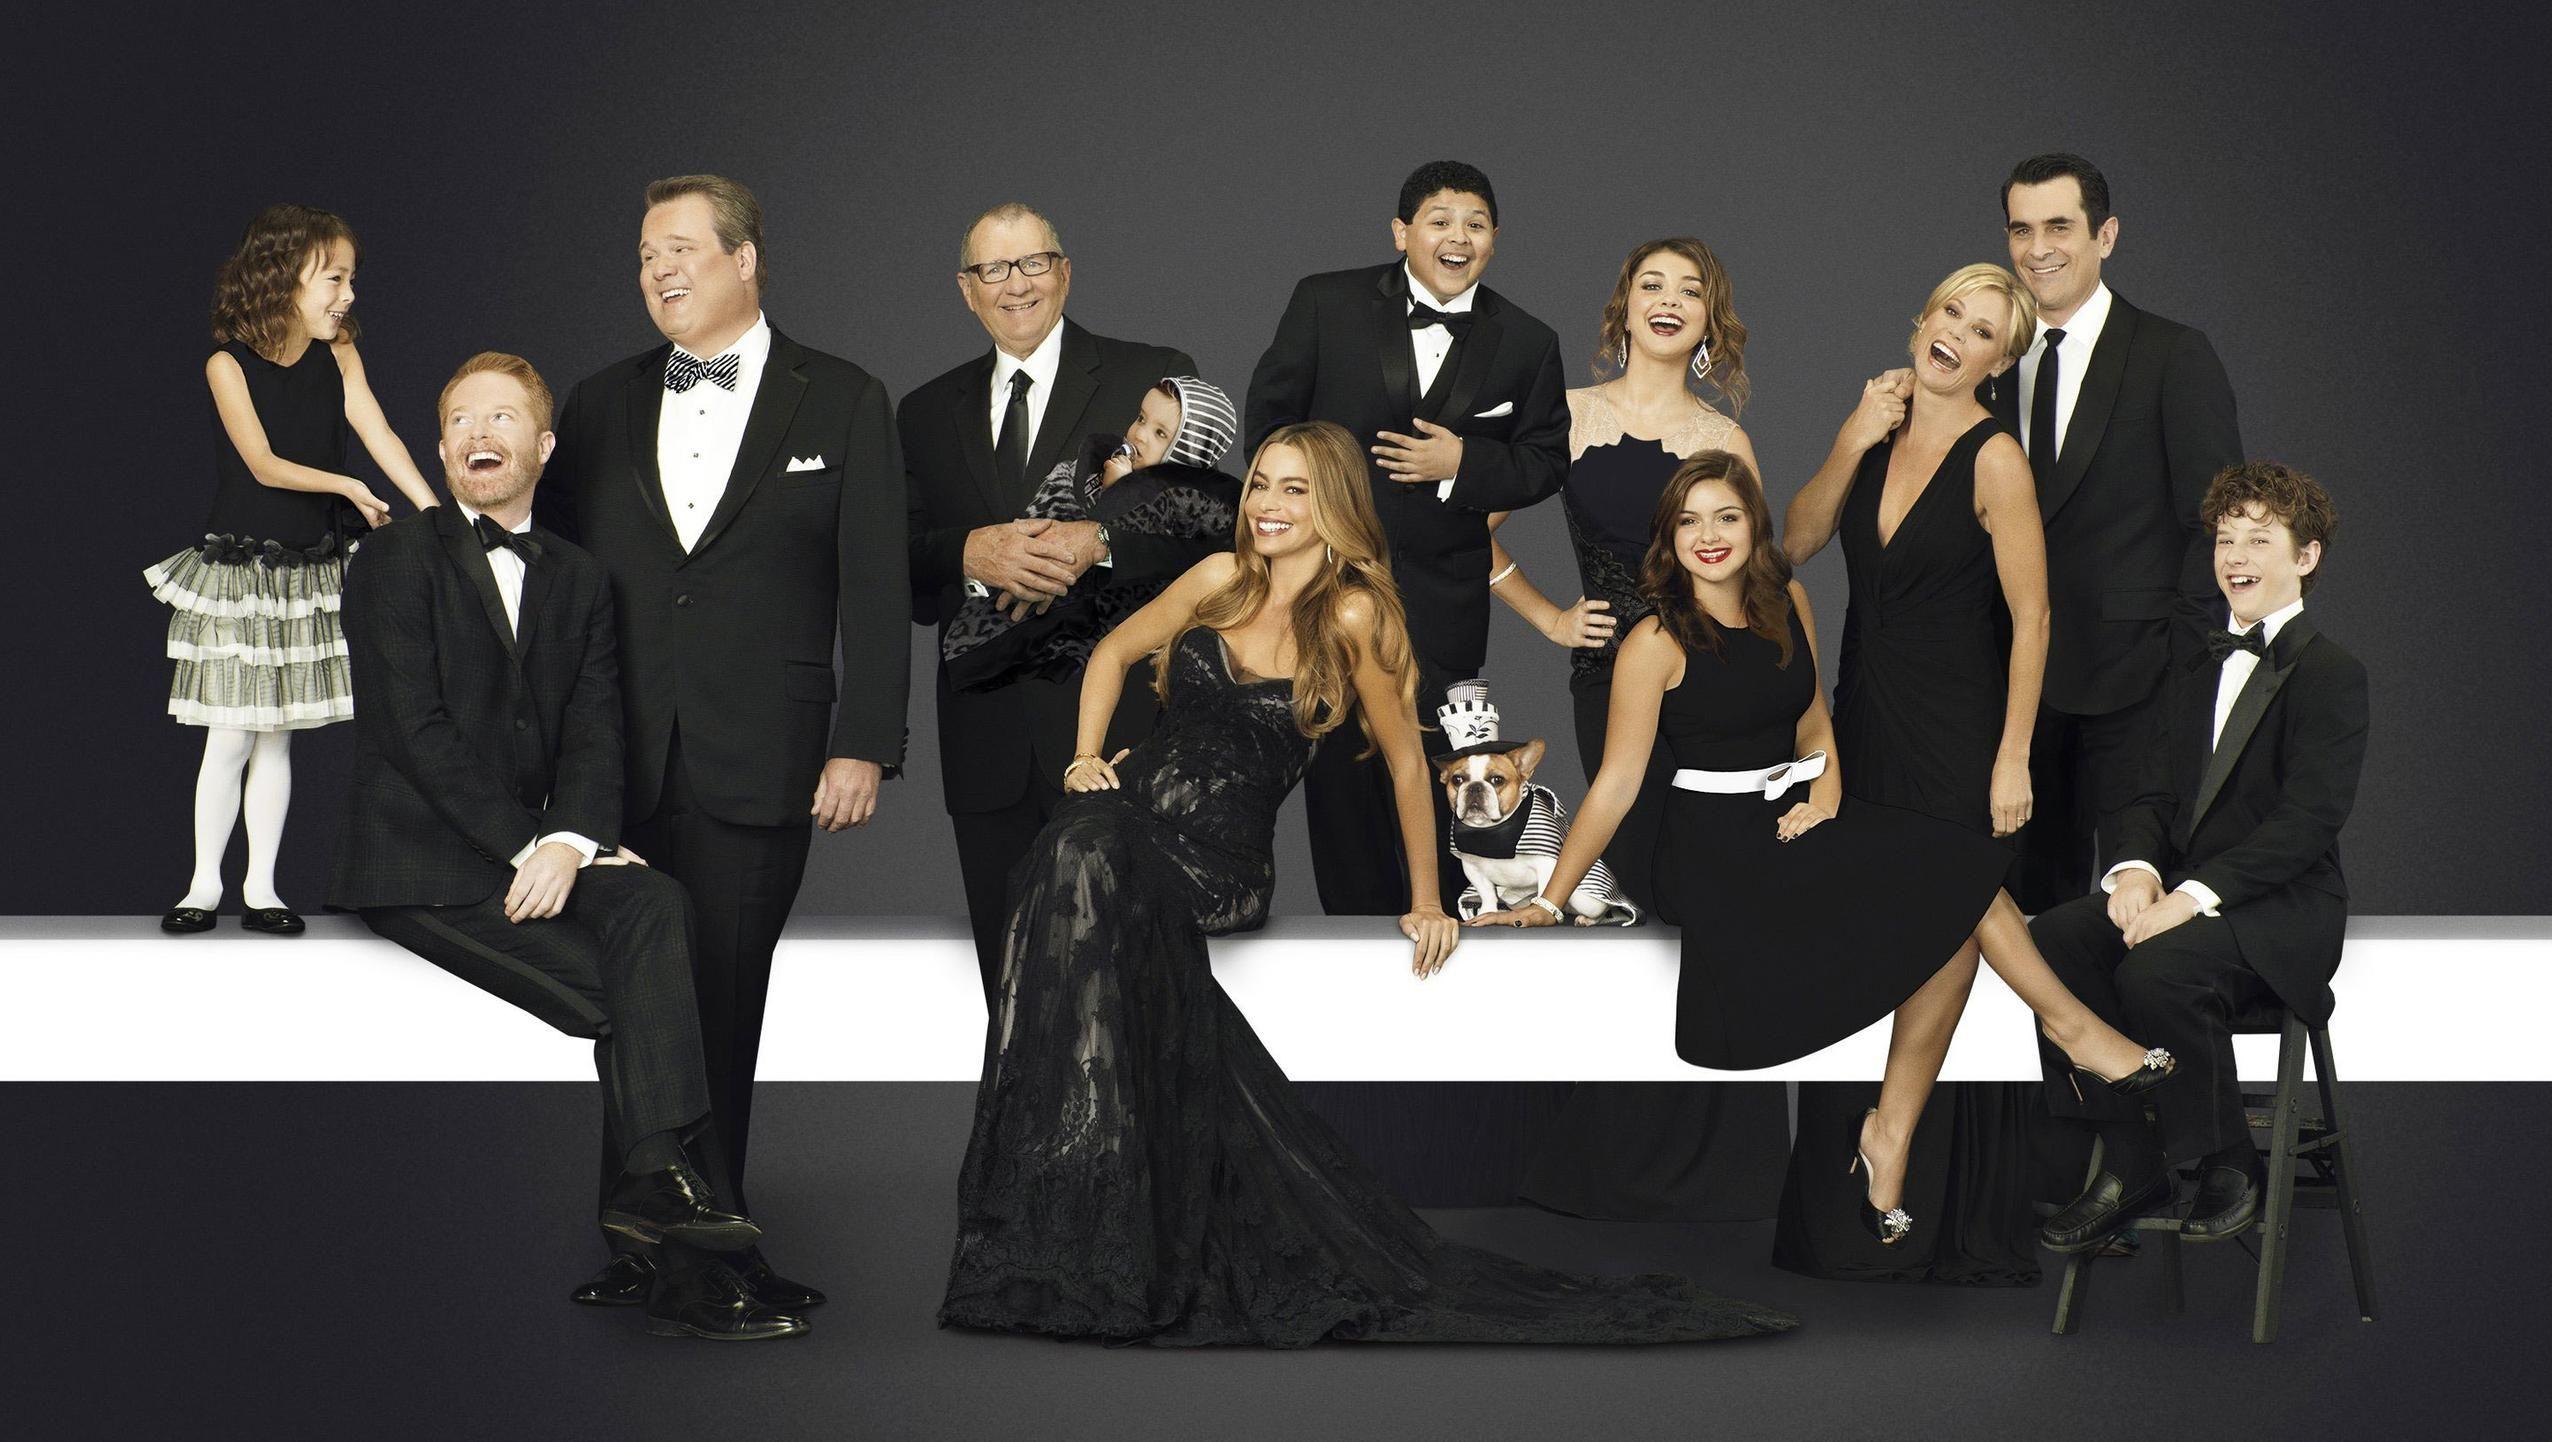 Modern Family Desktop Wallpaper Moviemania In 2020 Modern Family Tv Show Modern Family Season 5 Modern Family